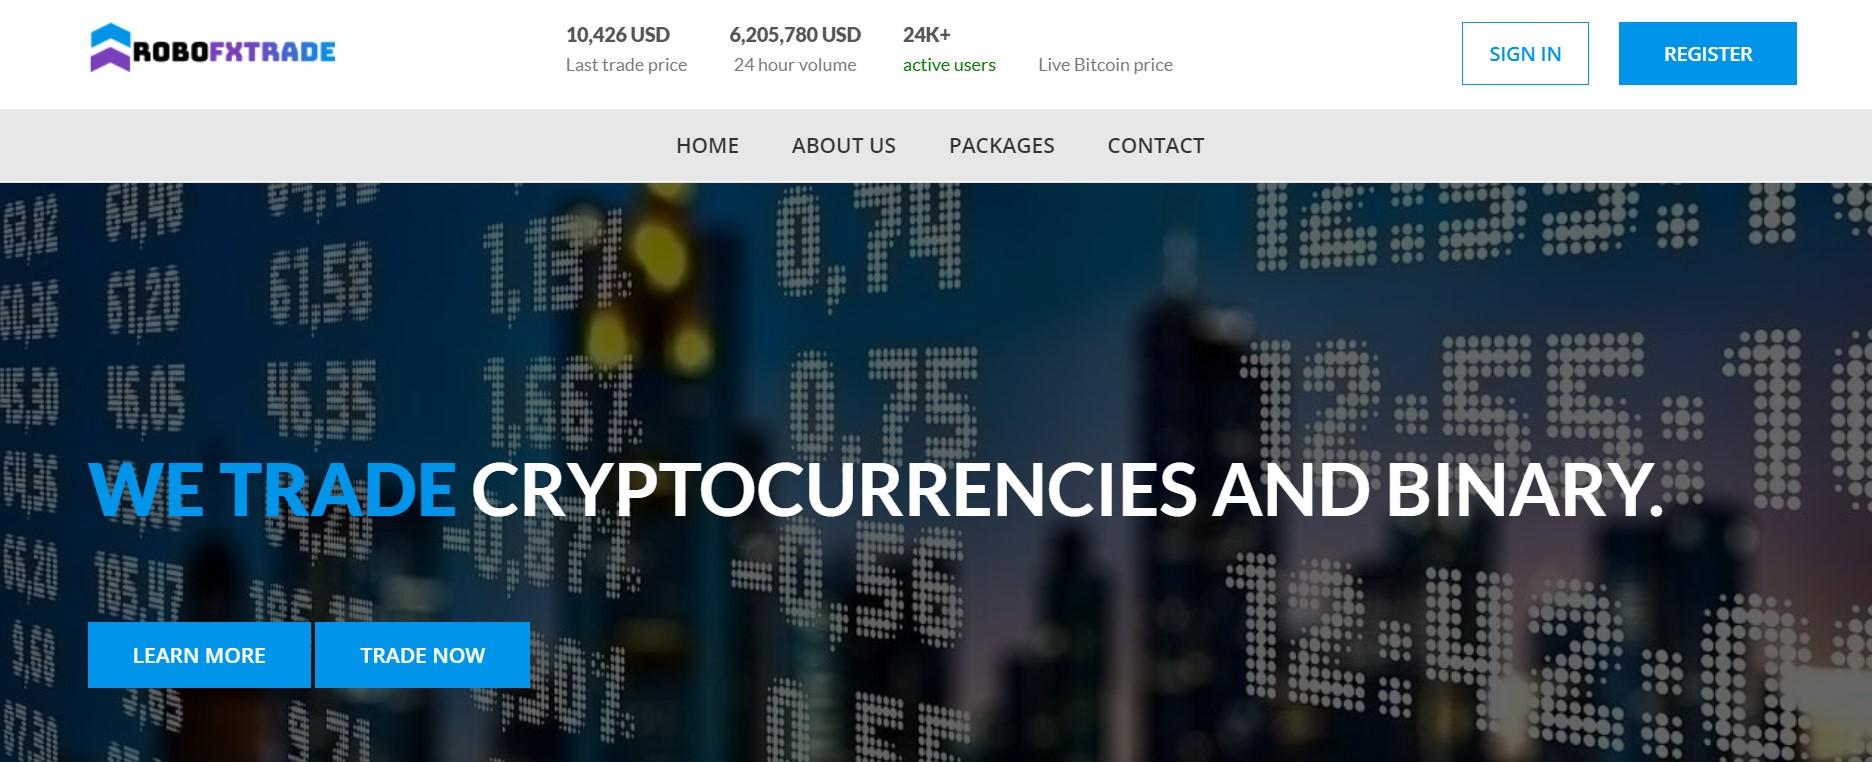 RoboFx Trade website